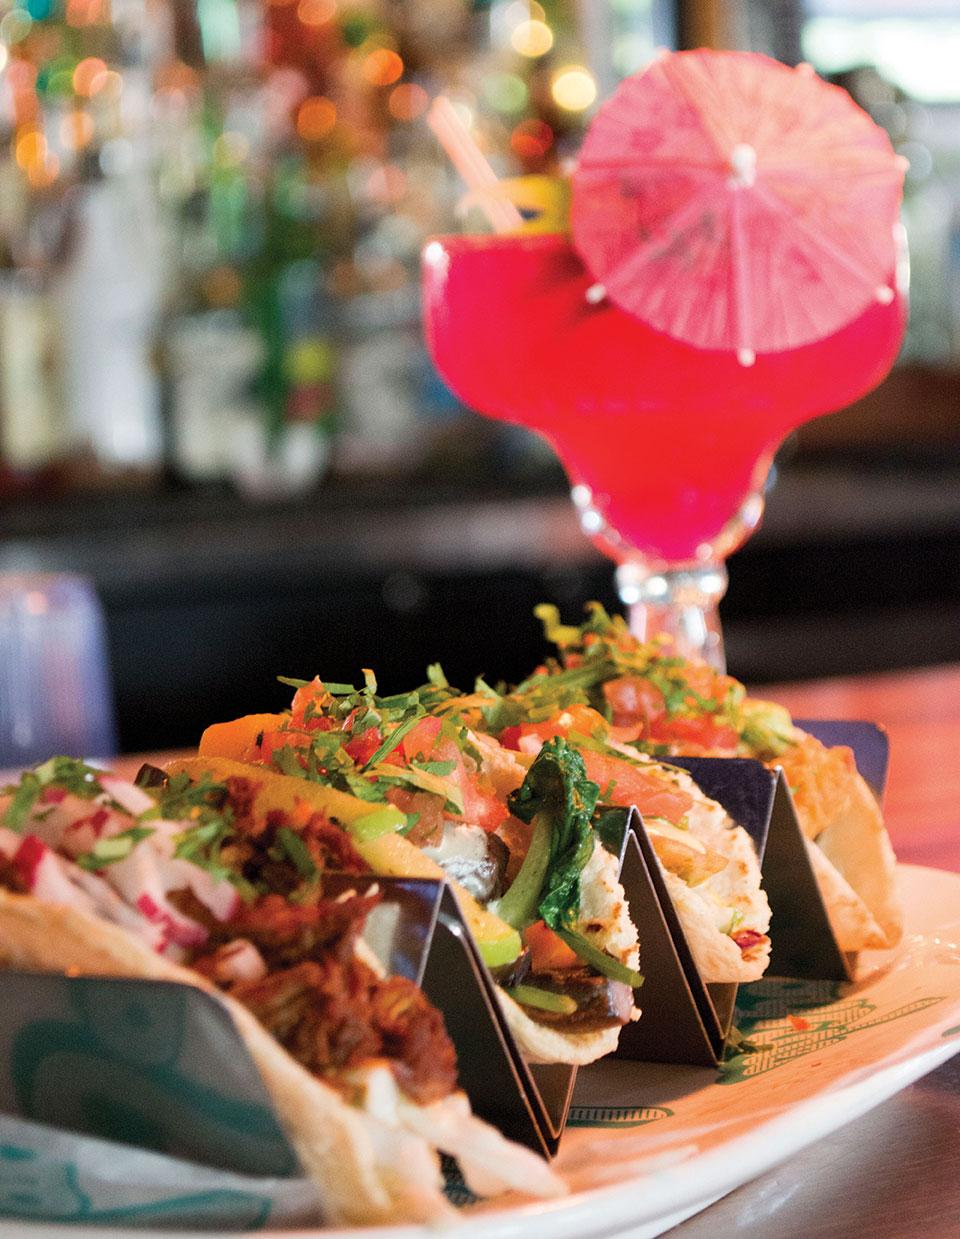 phoenix dining travel Joyride Tacos blood orange margarita